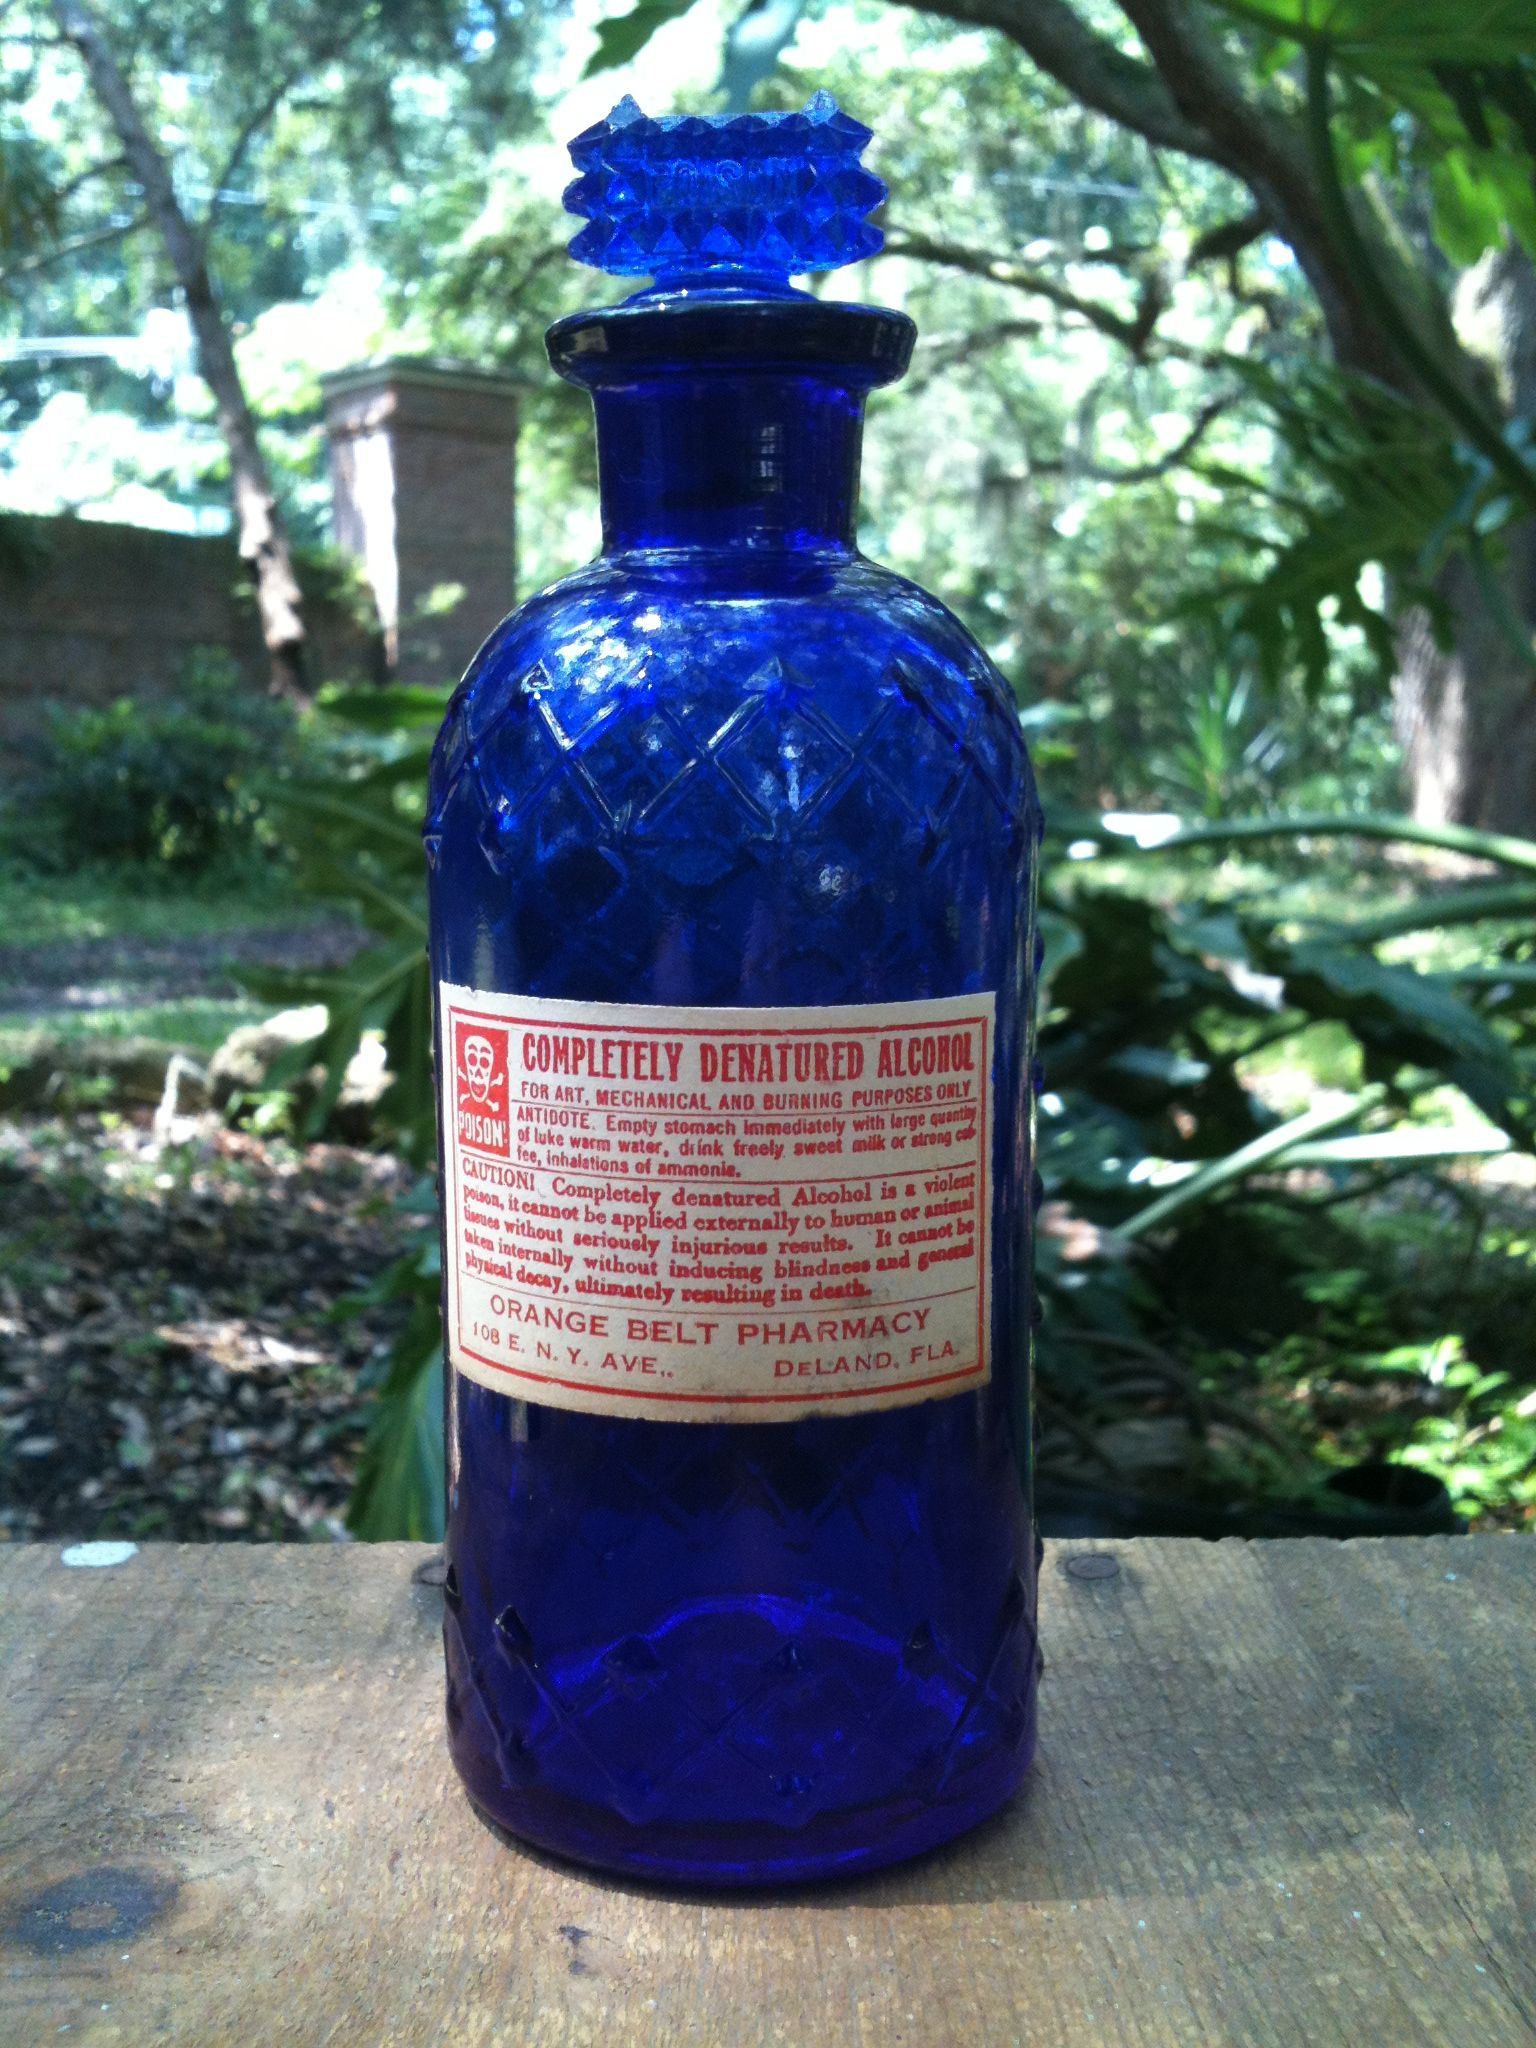 "Cobalt blue ""Diamond & latice"" poison, circa 1900 from ORANGE BELT PHARMACY DELAND, FLA"